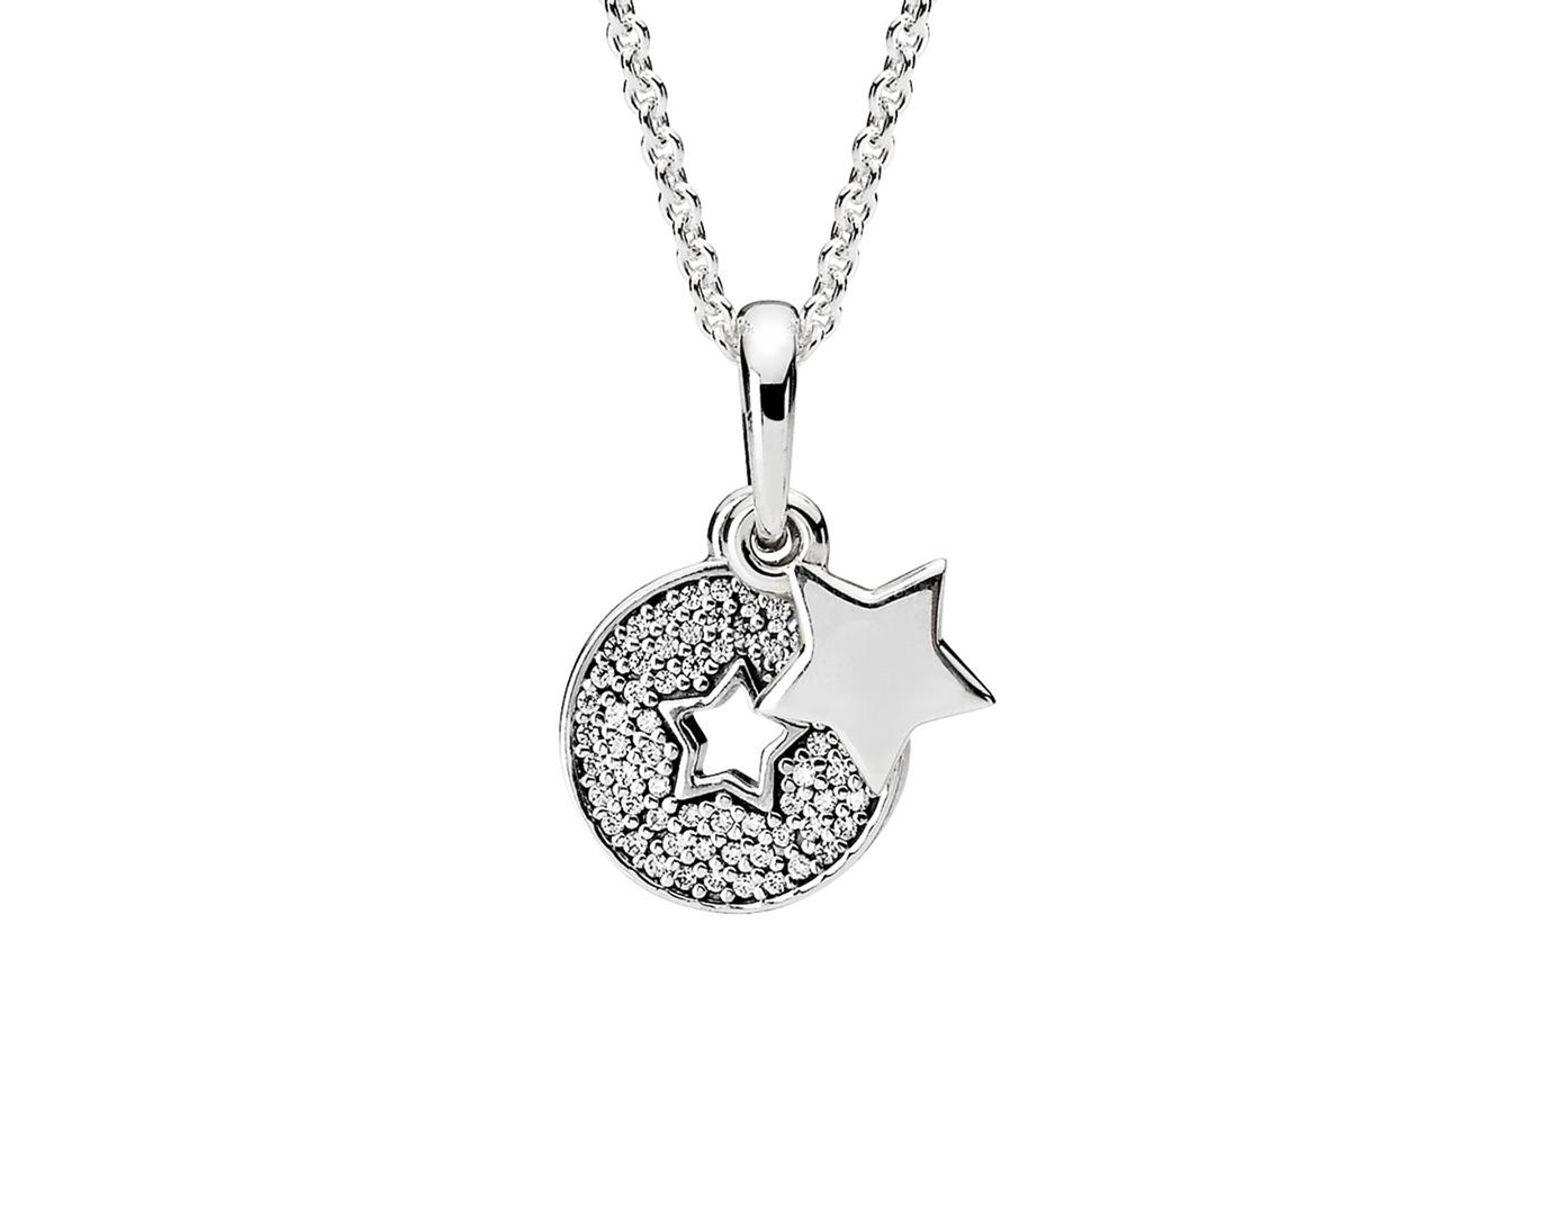 eafaa4afeeb8d Women's Metallic Silver Cz Celebration Stars Necklace